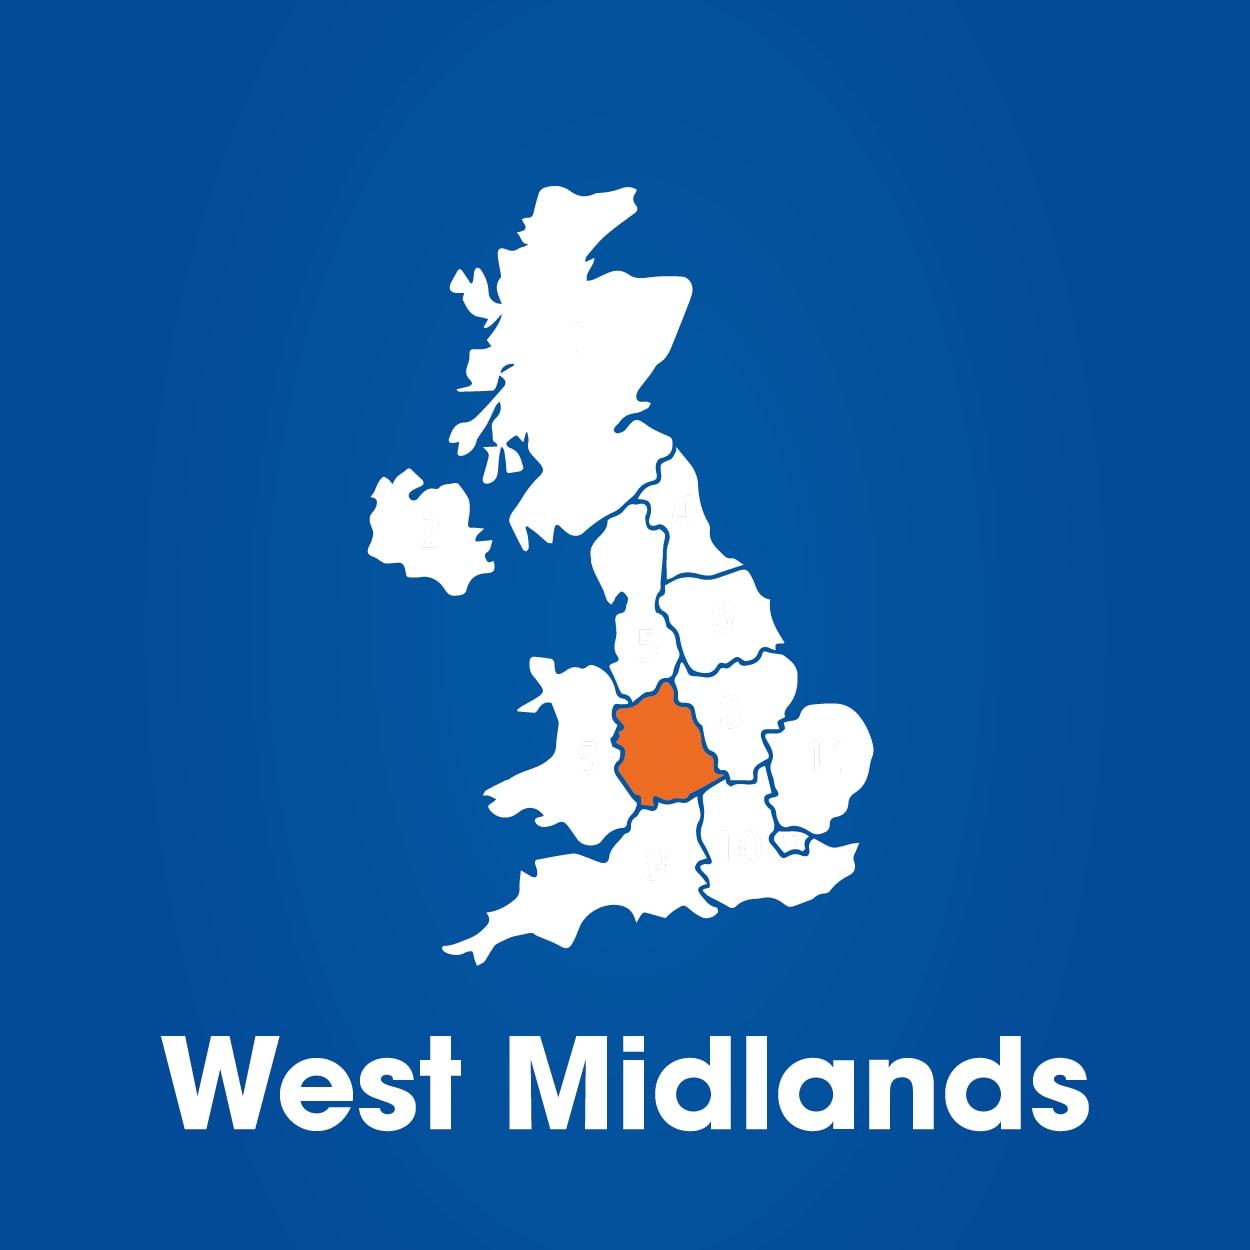 west midlands on UK map